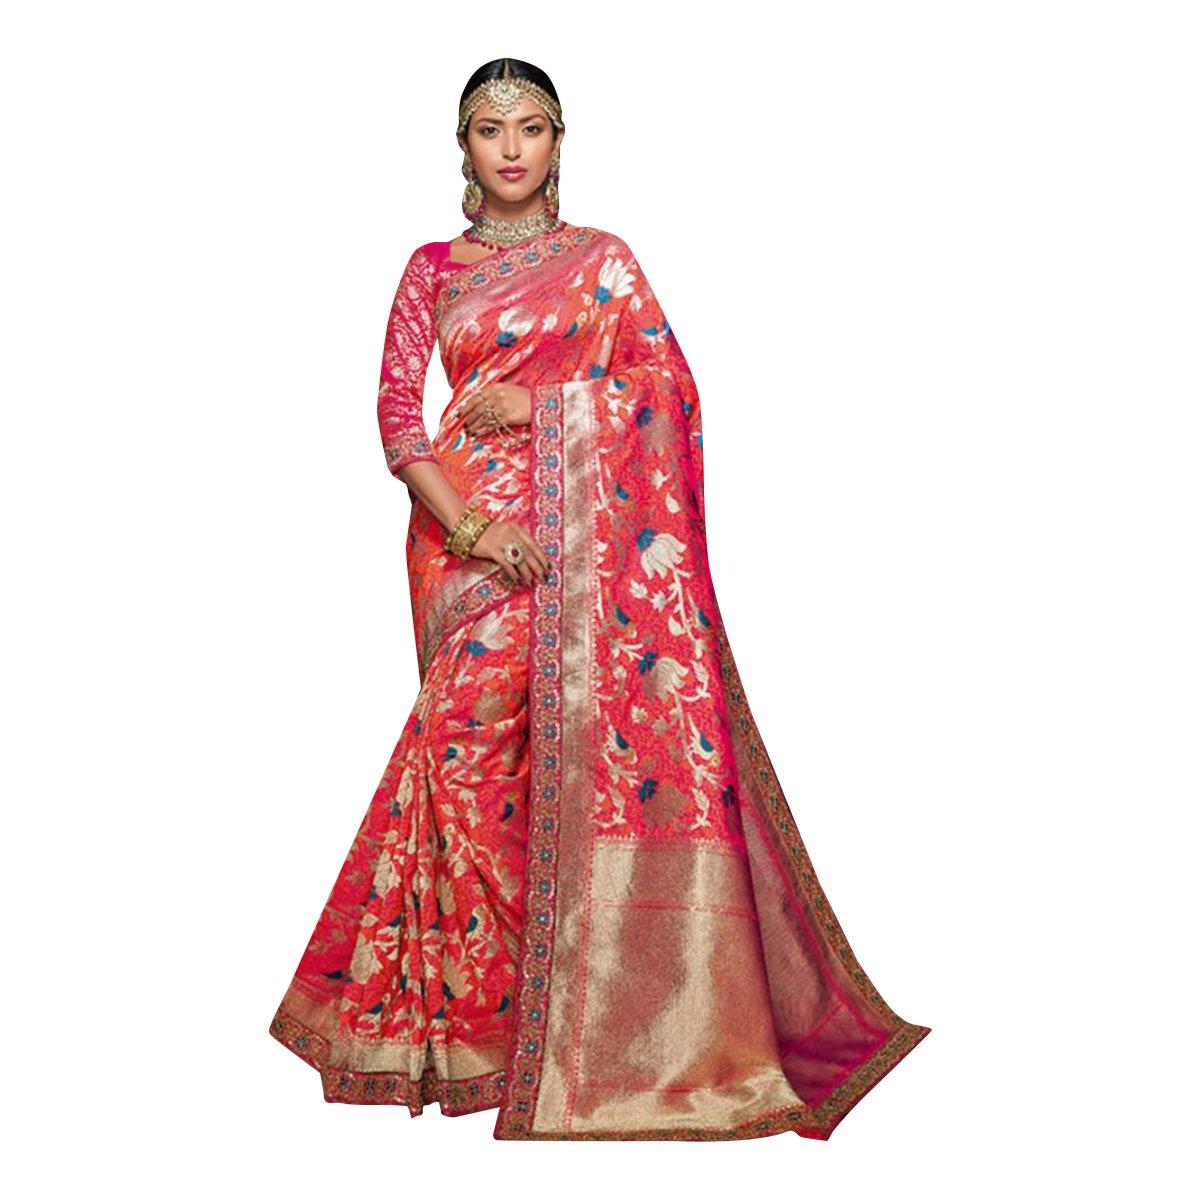 BOLLYWOOD DESIGNER SILK SAREE SARI BLOUSE WEDDING CEREMONY PARTY INDIAN WOMEN 341